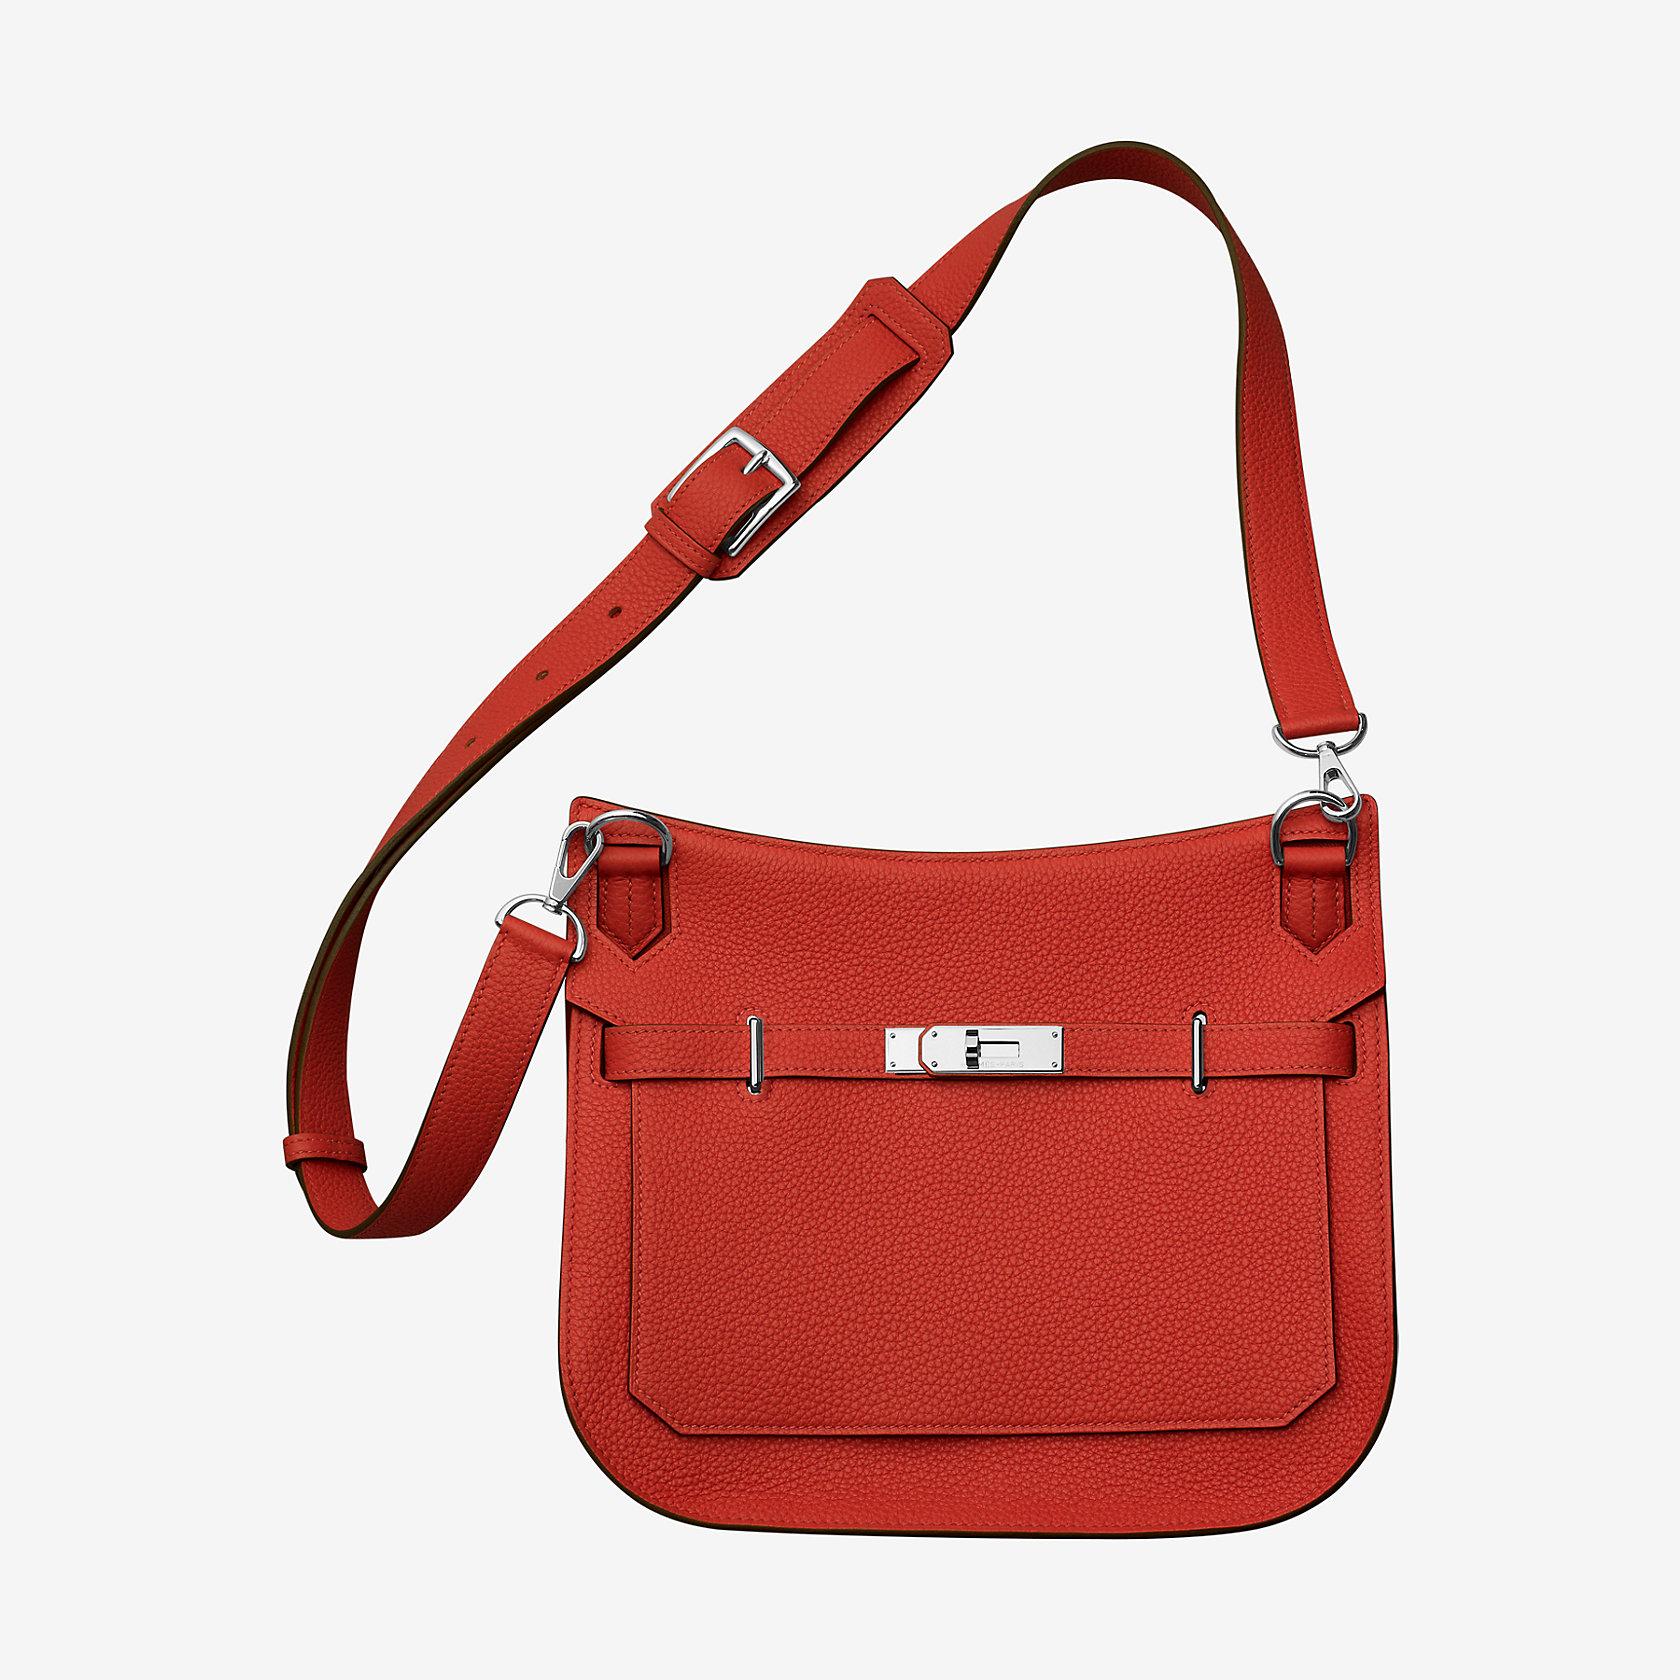 d342acbb3f Jypsiere 28 bag | Hermès